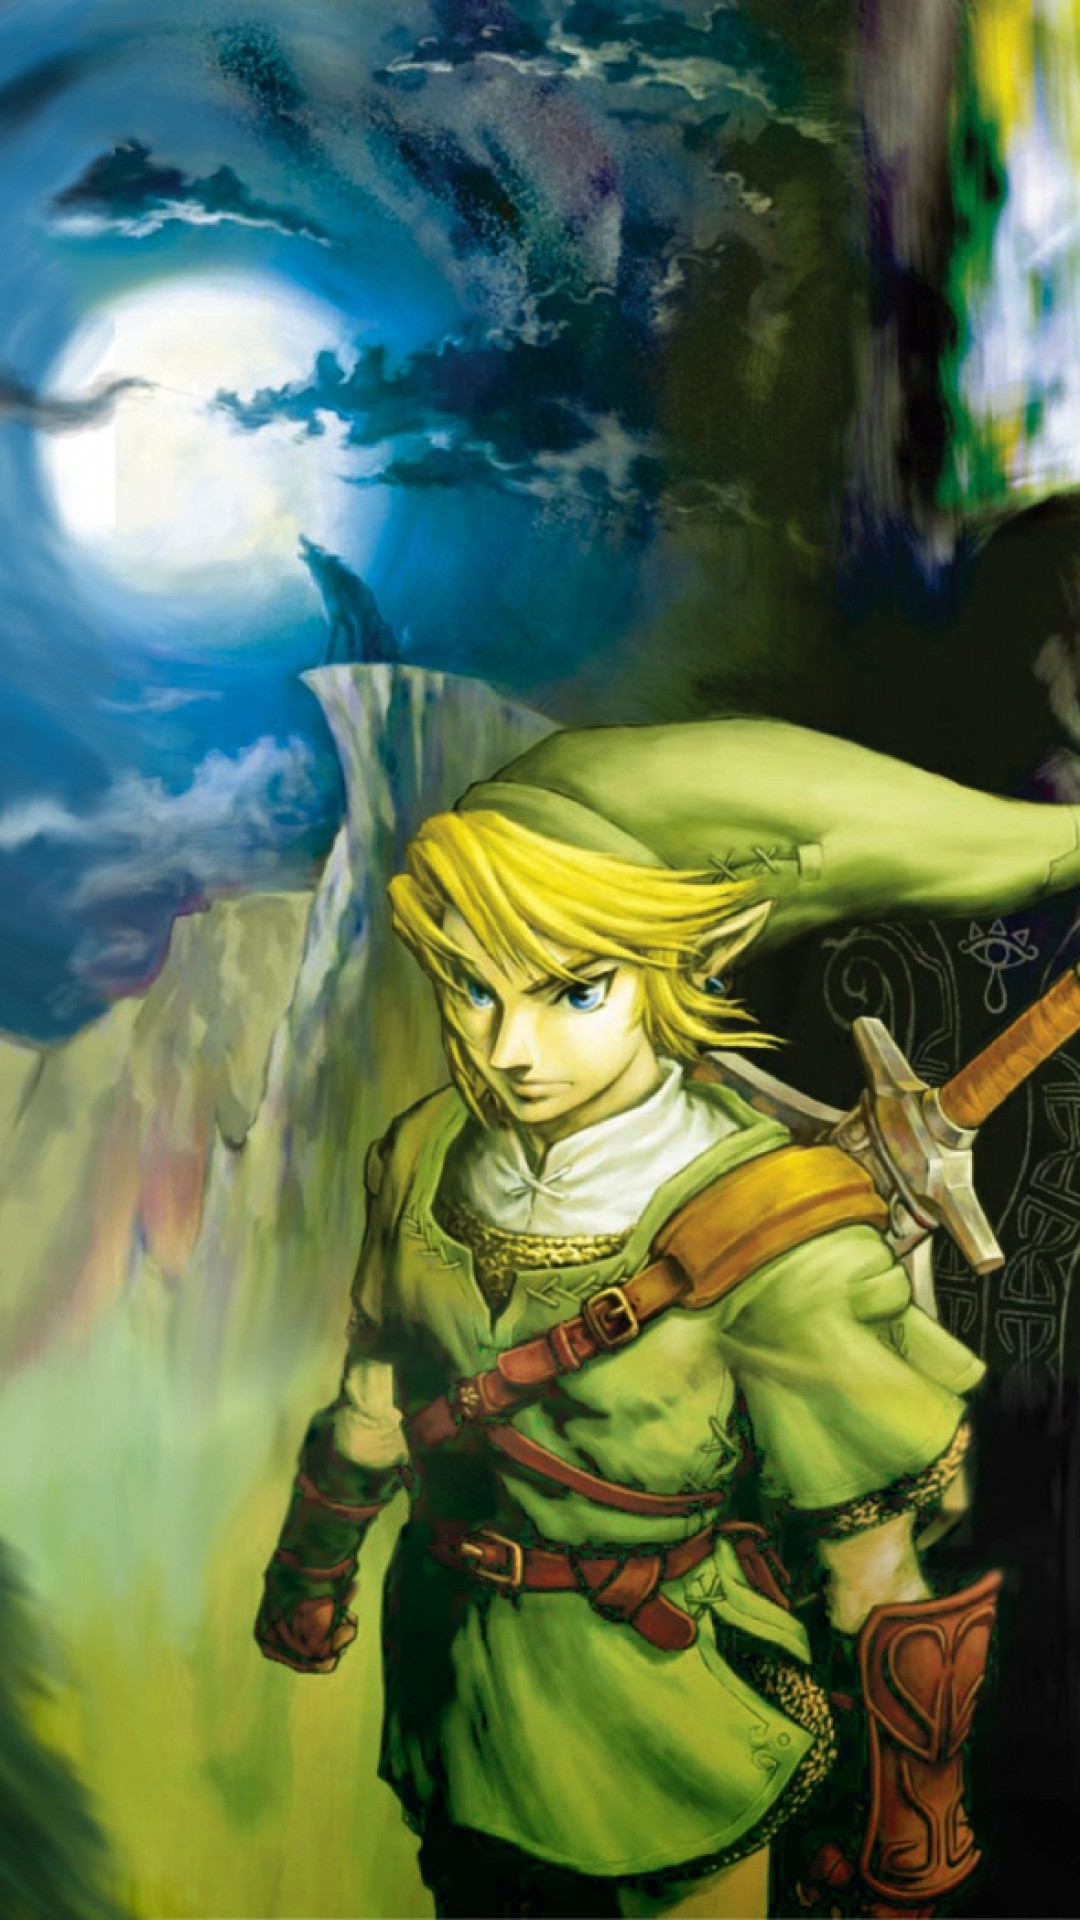 Zelda live wallpaper 70 images - Twilight wallpaper for iphone ...